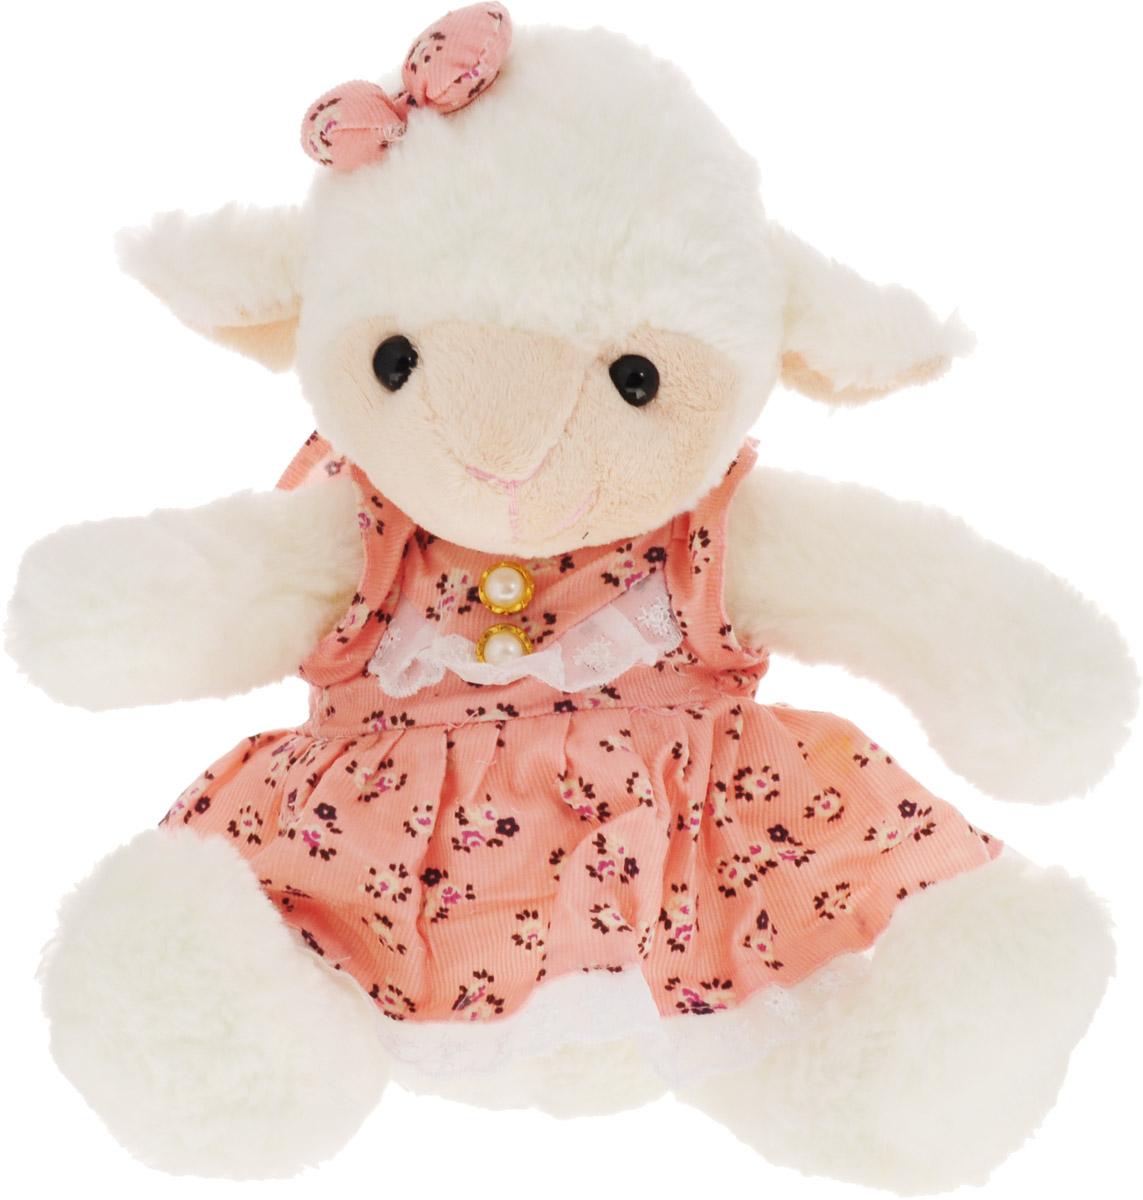 Фото - Magic Bear Toys Мягкая игрушка Овечка девочка цвет розовый 23 см magic bear toys мягкая игрушка овечка цвет фиолетовый 42 см